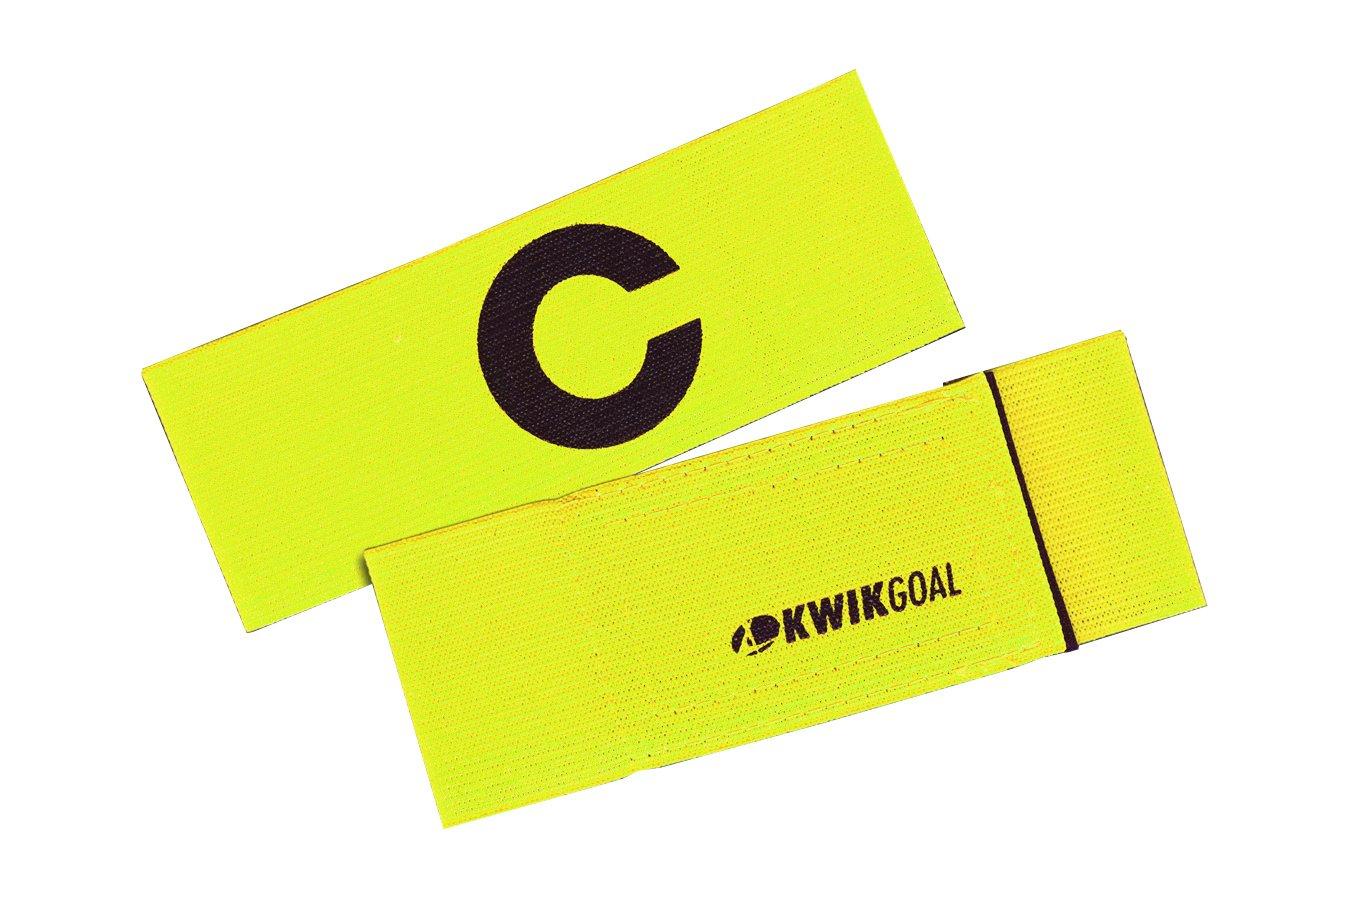 Kwik Goal Captain C Arm Band